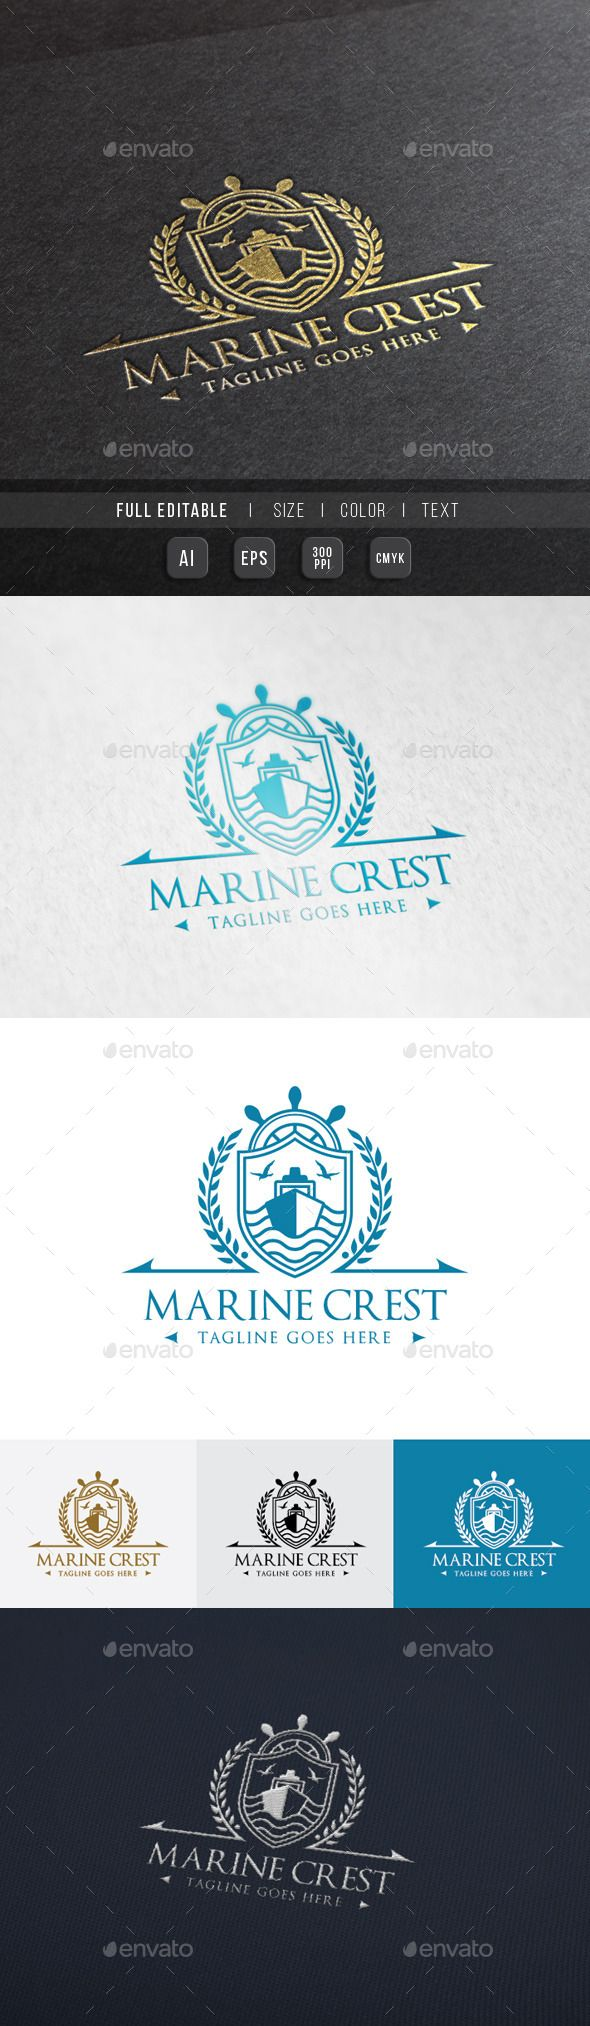 Royal Marine Ship Template #design Download: http://graphicriver.net/item/royal-marine-ship-/10111478?ref=ksioks